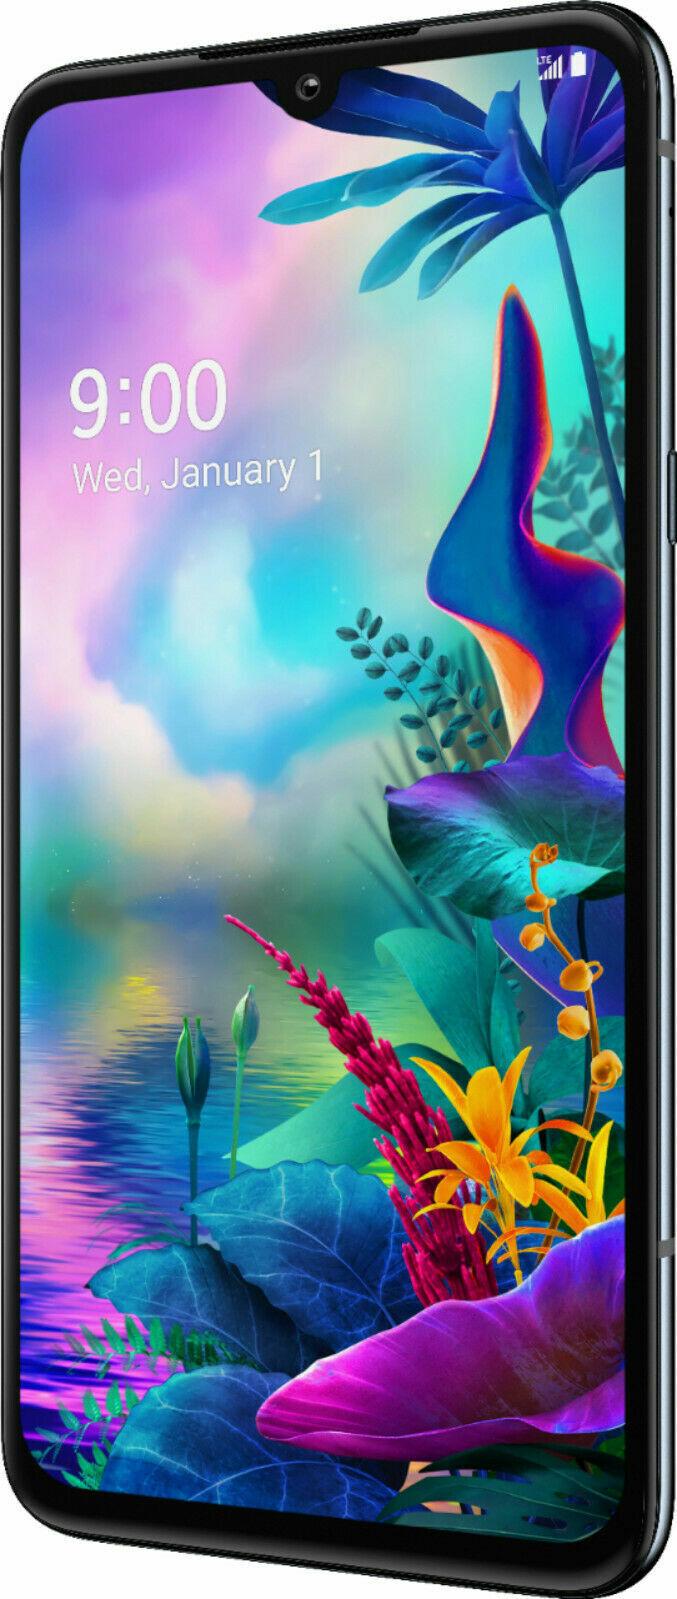 Android Phone - LG G8X ThinQ LMG850UM9 - 128GB - Black (Sprint T-mobile AT&T) 9/10 GSM Unlocked